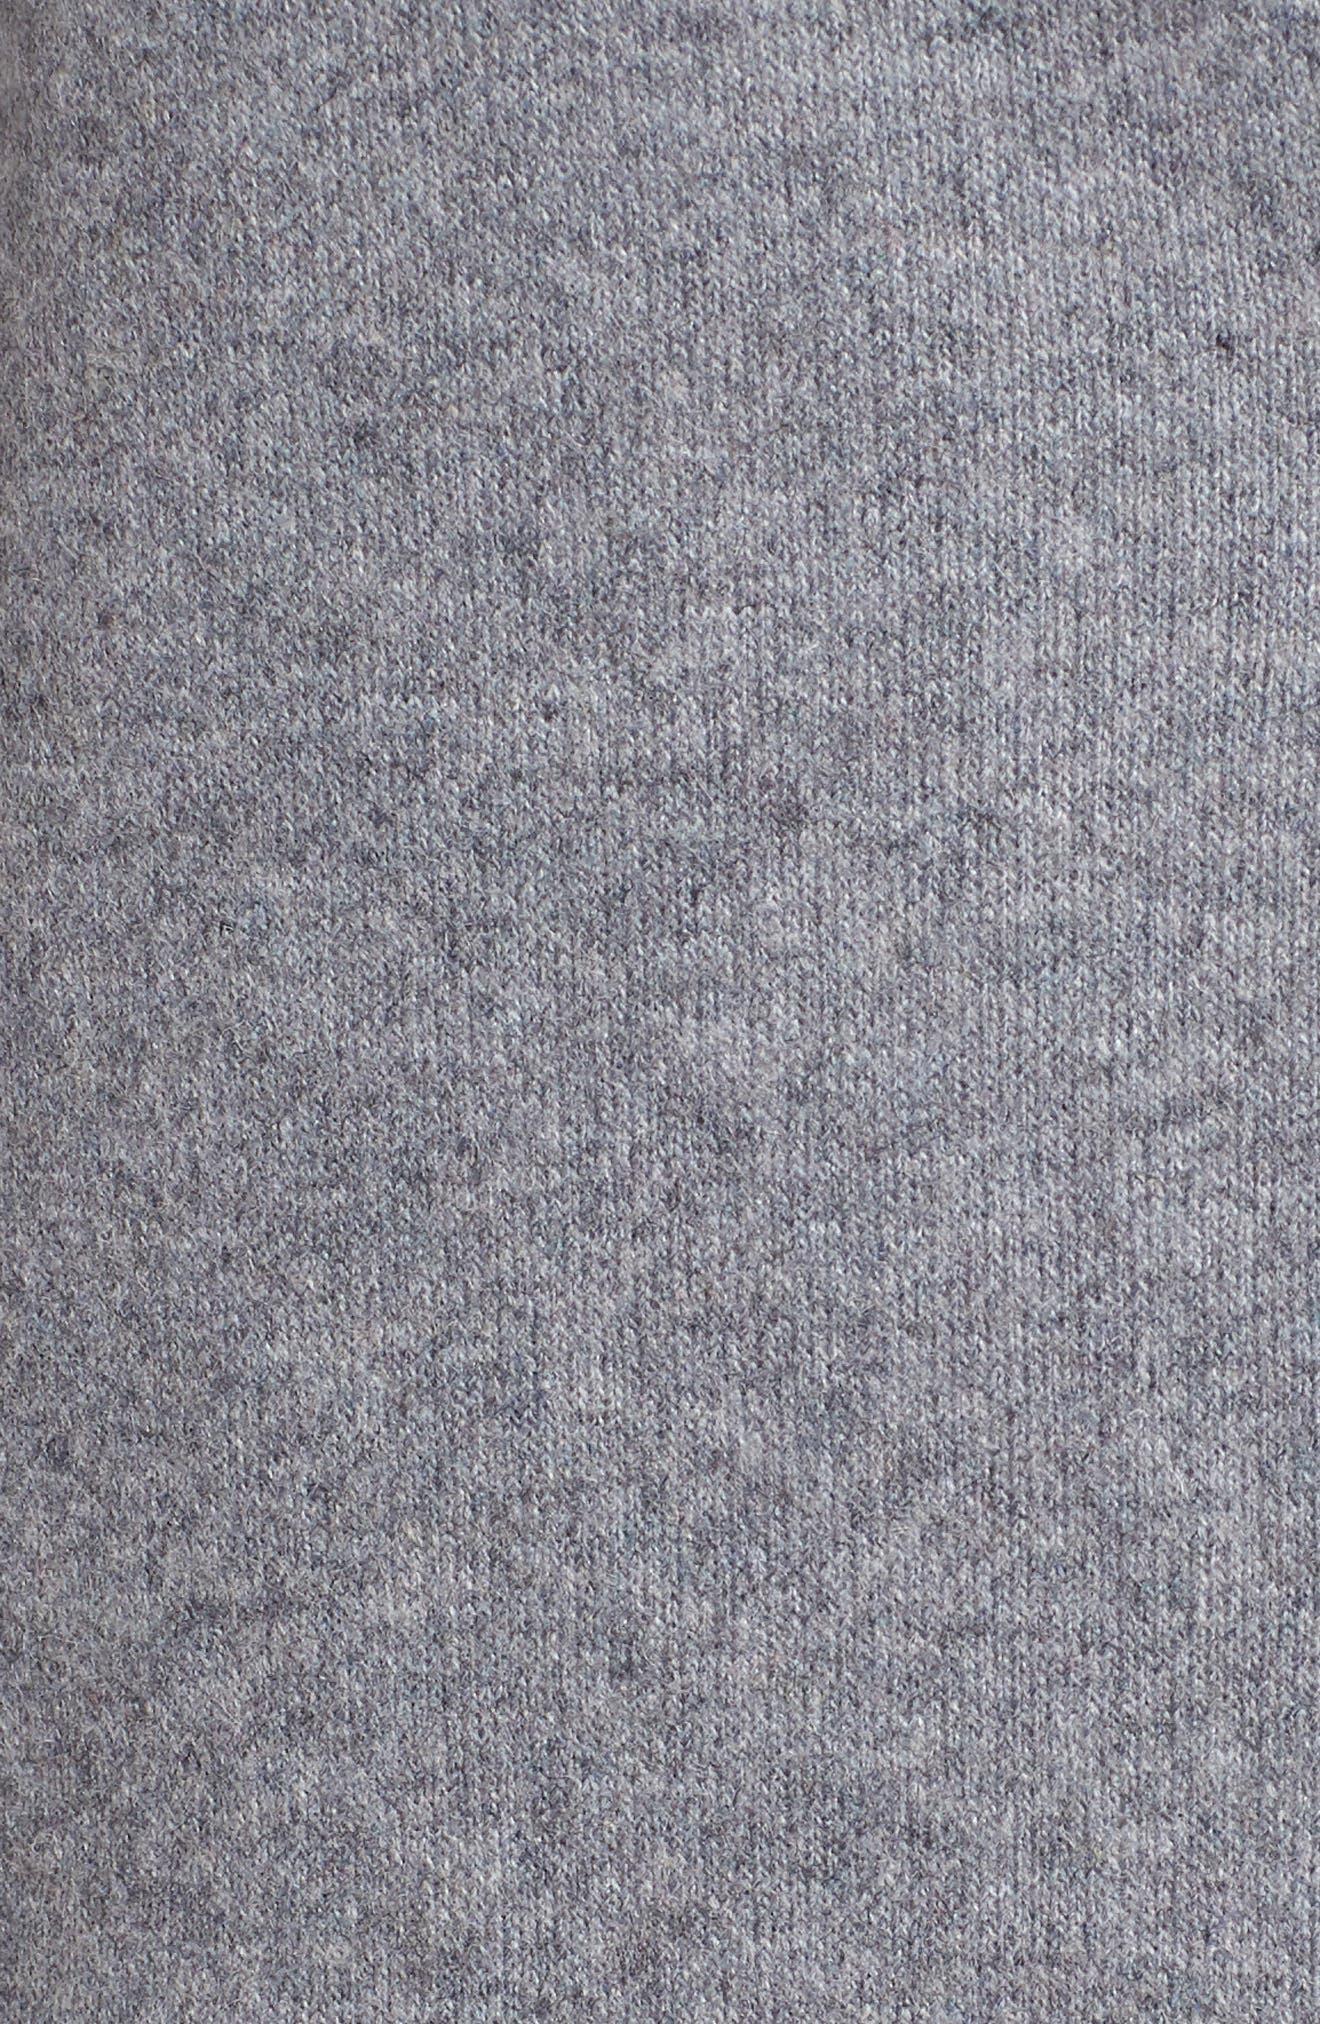 KENNETH COLE NEW YORK,                             Envelope Collar Wool Blend Knit Coat,                             Alternate thumbnail 7, color,                             033